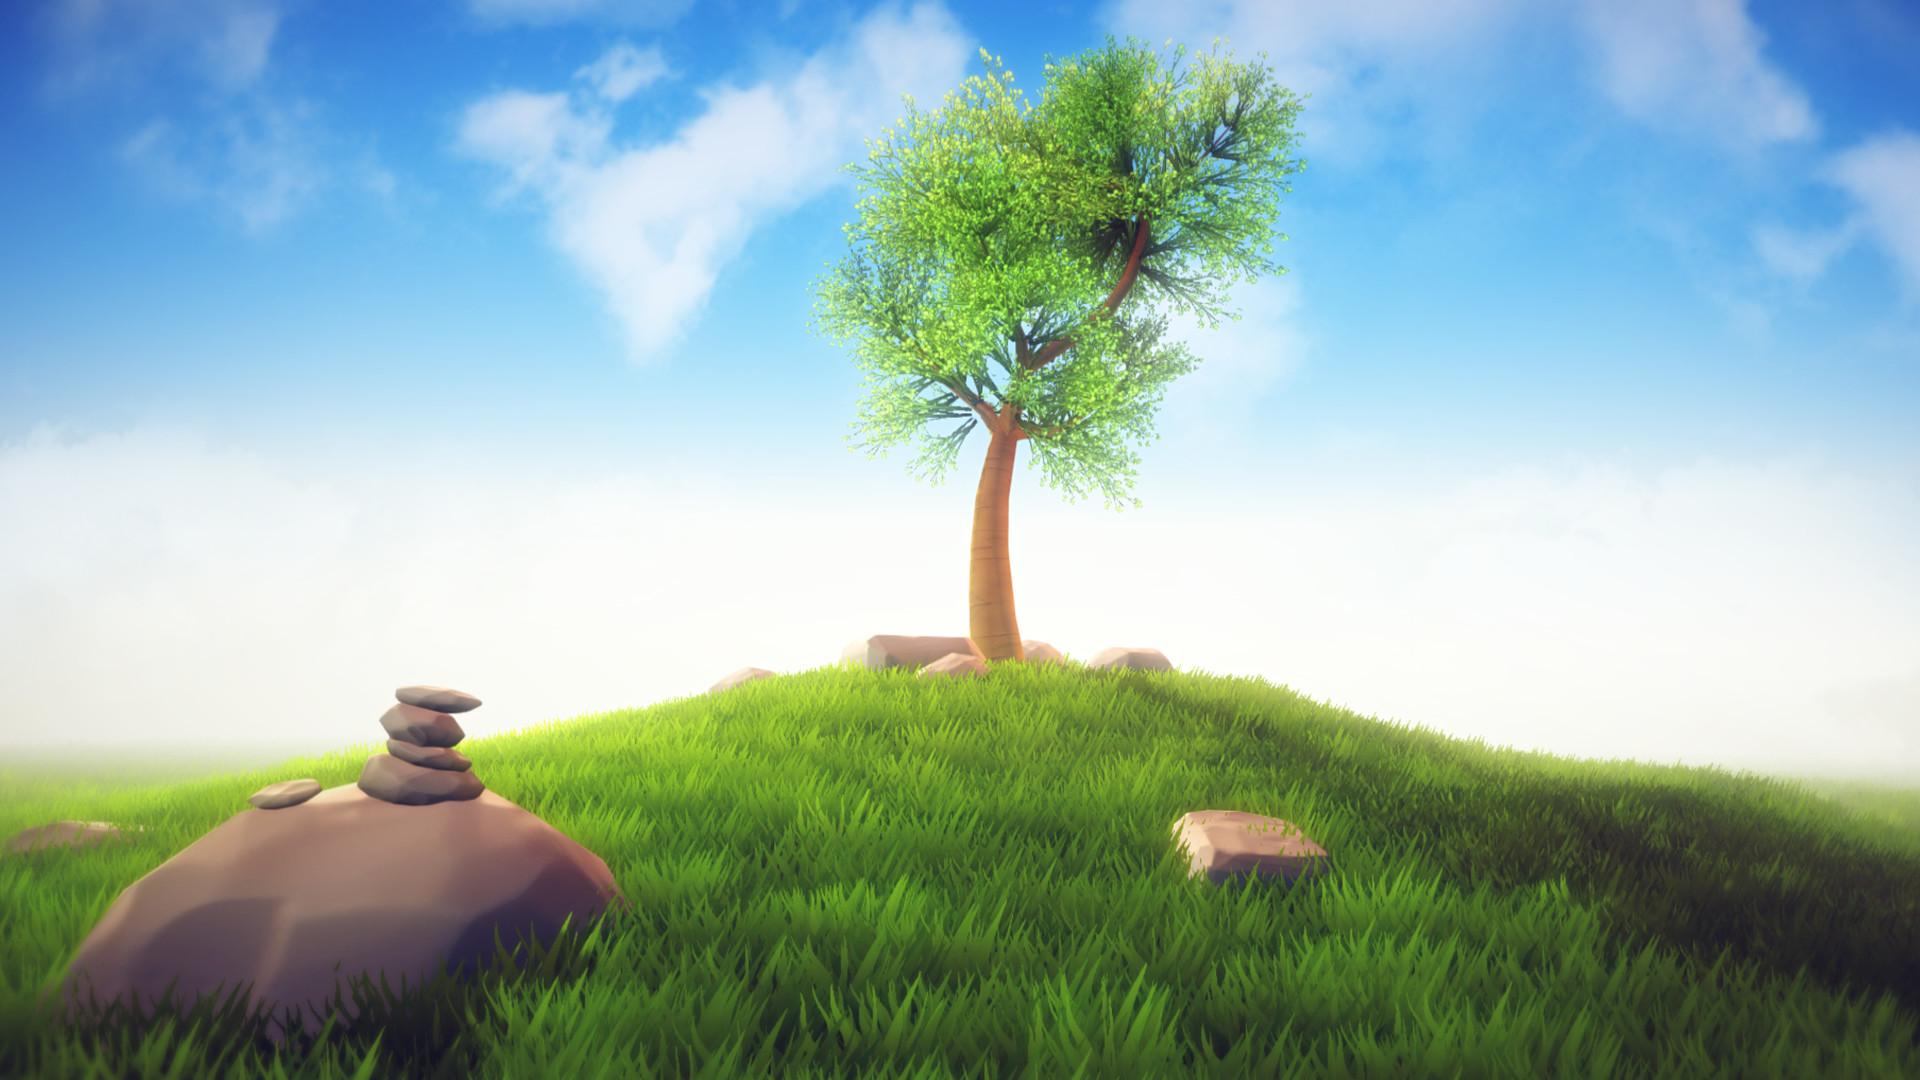 ArtStation - Unity Asset Packs - Dreamscapes | Nature